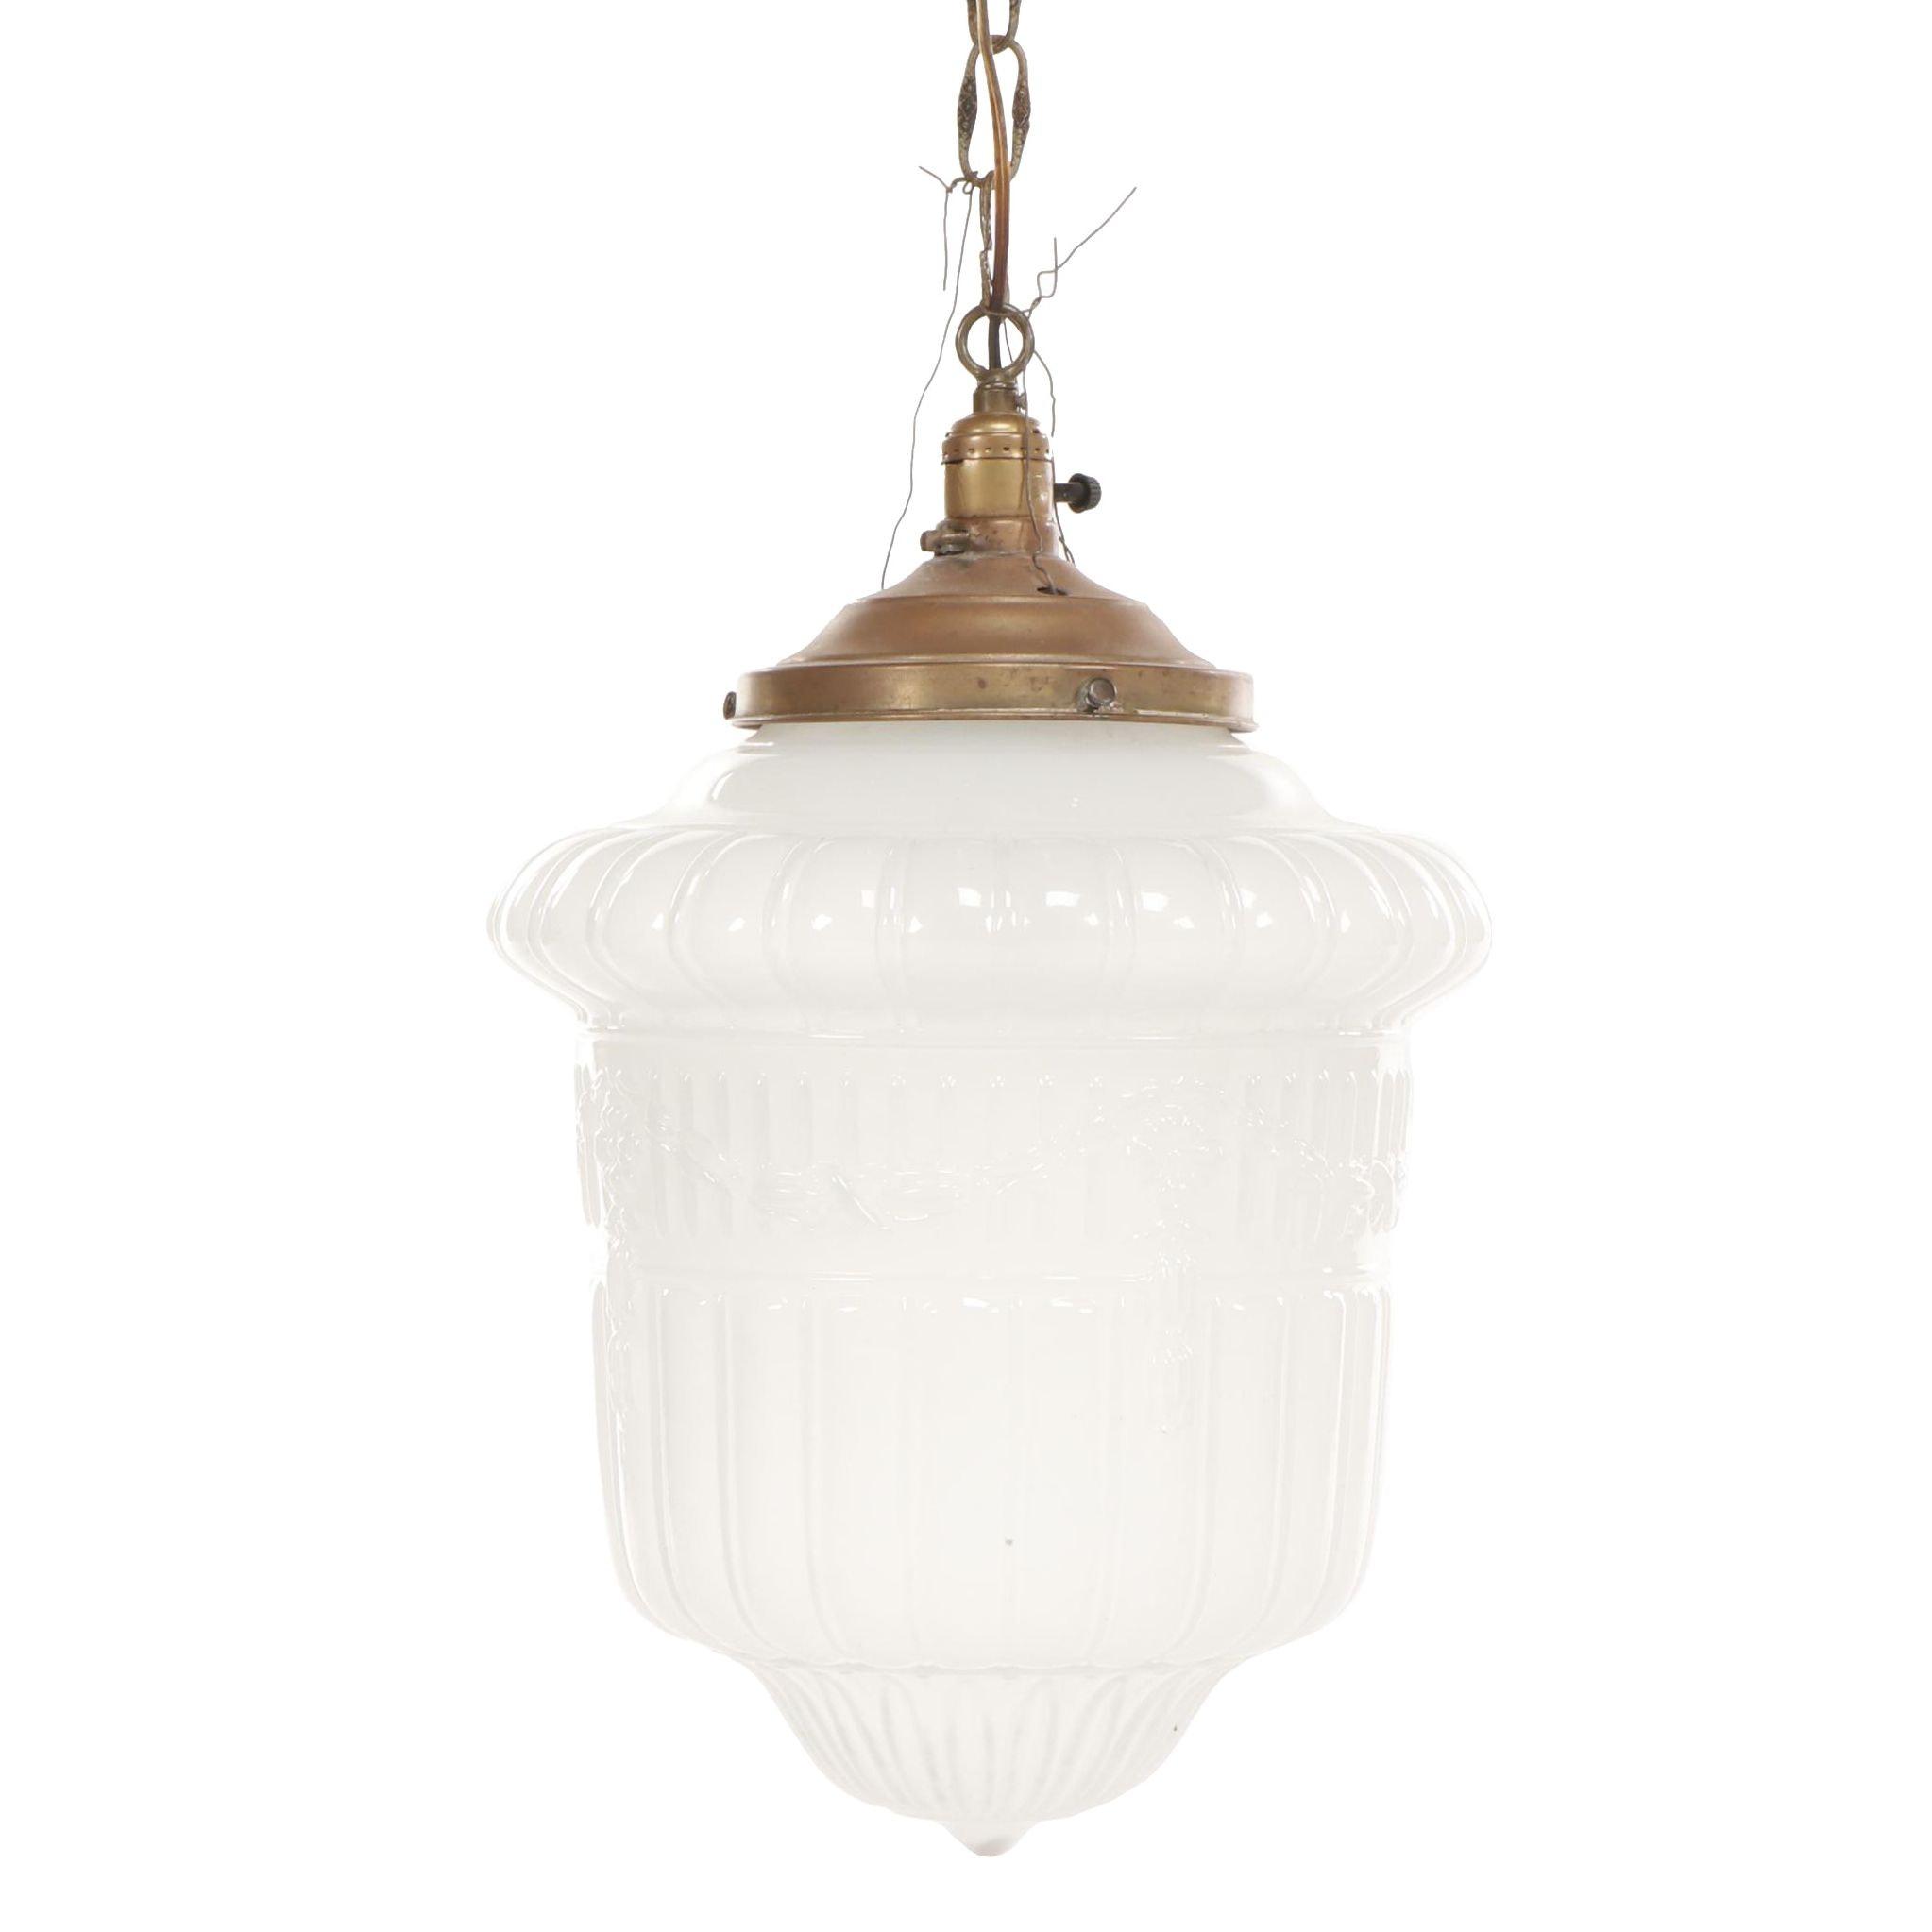 Eagle Glass Pendant Light Fixture